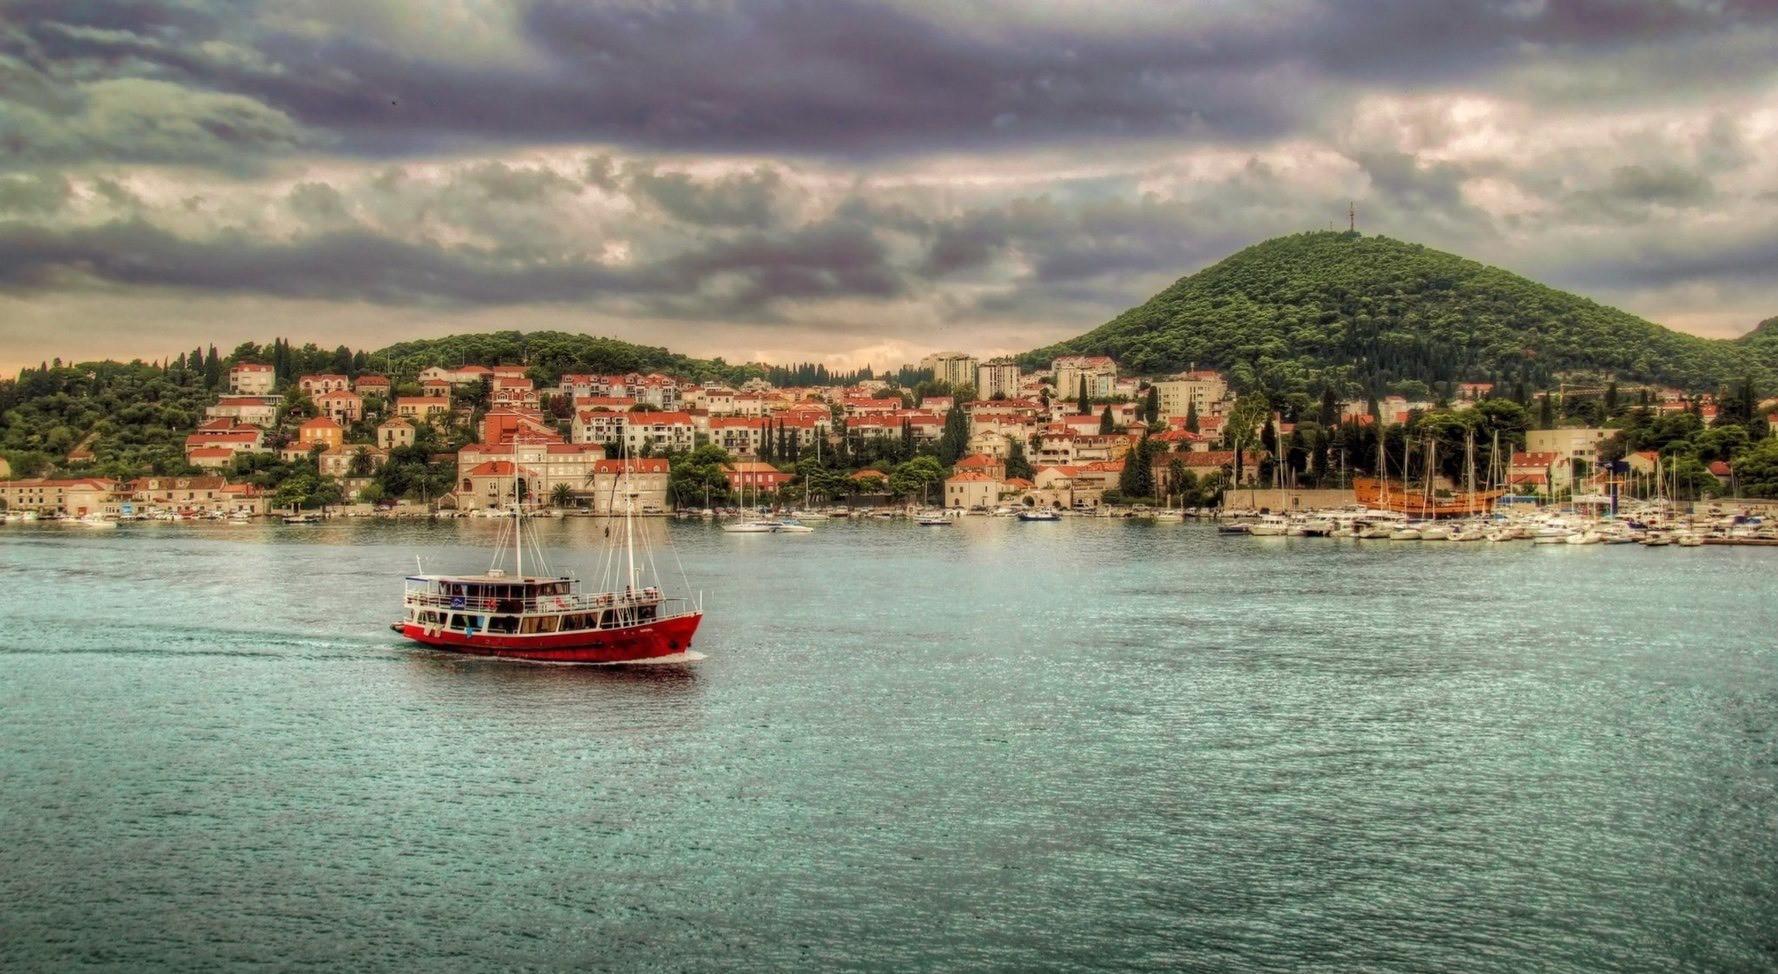 dubrovnik_croatia_boat-wallpaper-2048x11